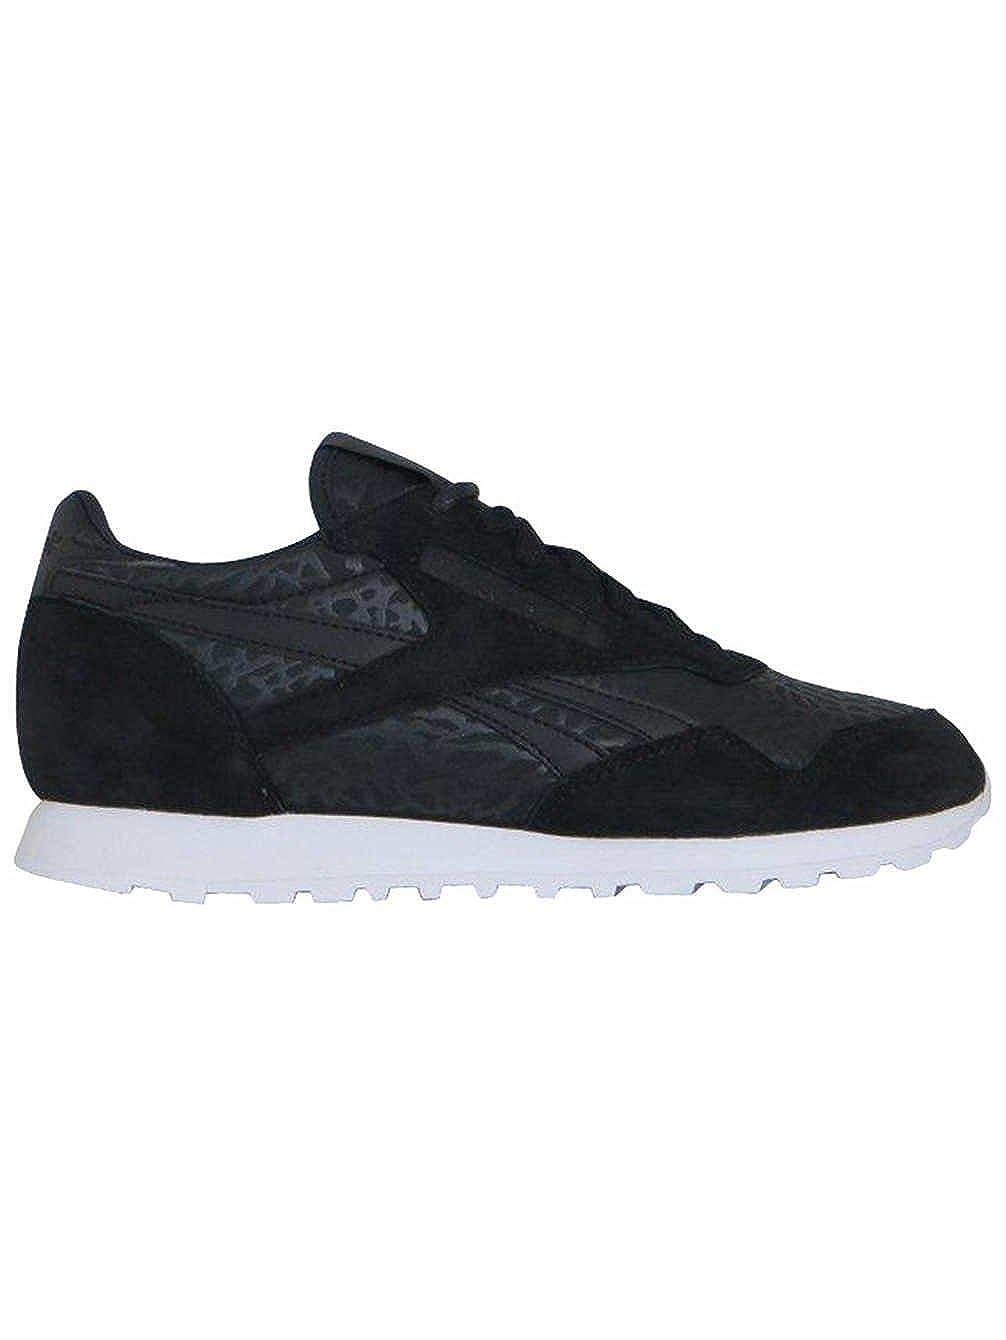 Reebok Paris Runner Gallery II Donna Sneaker Nero